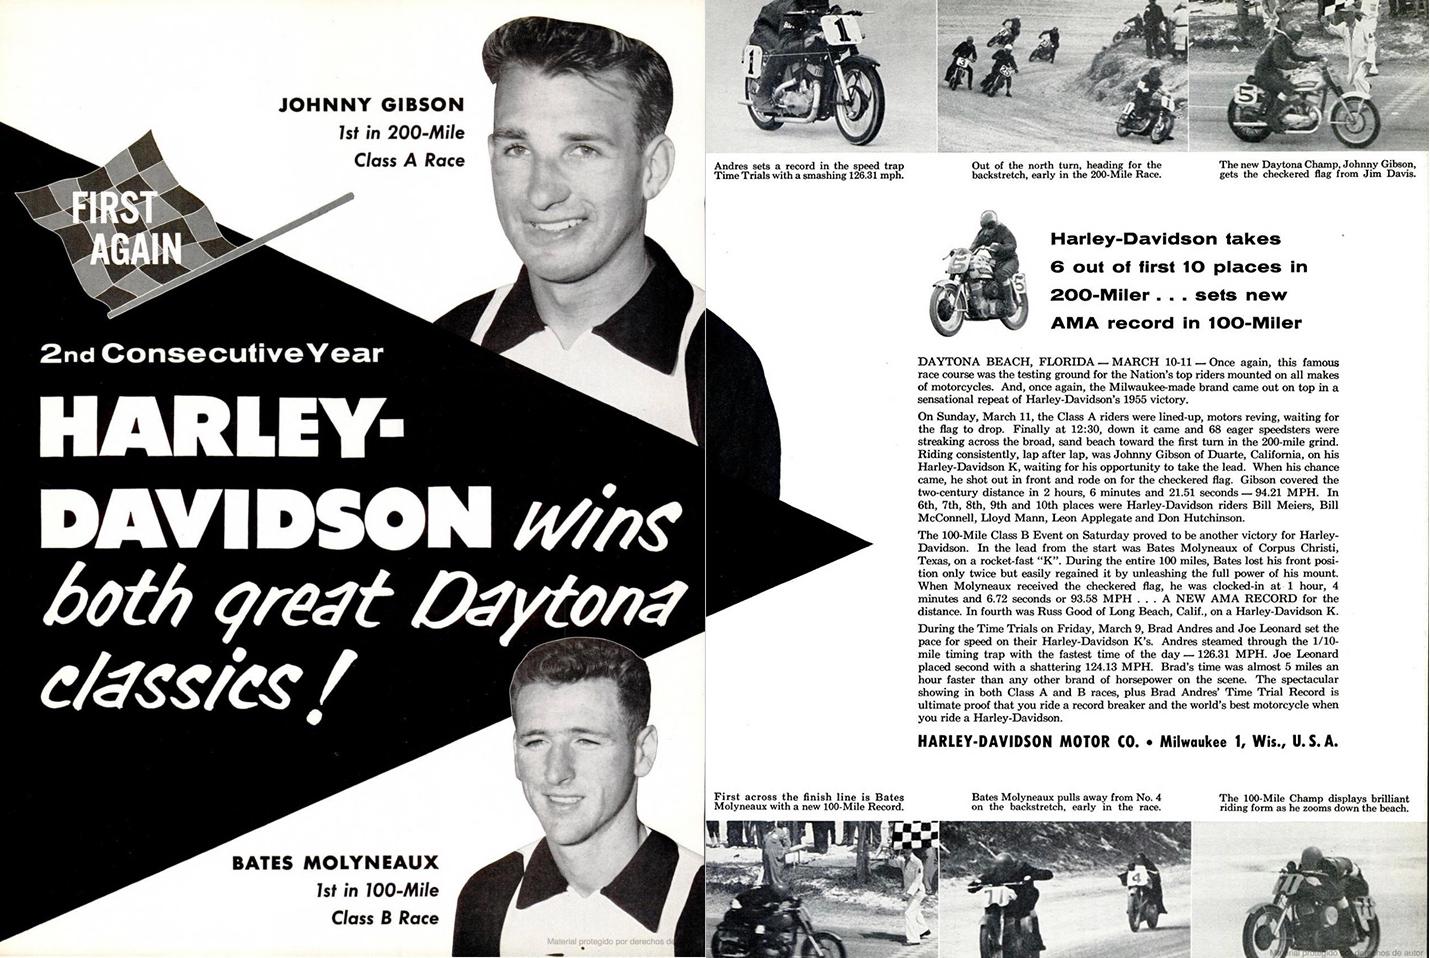 Victoria en Daytona